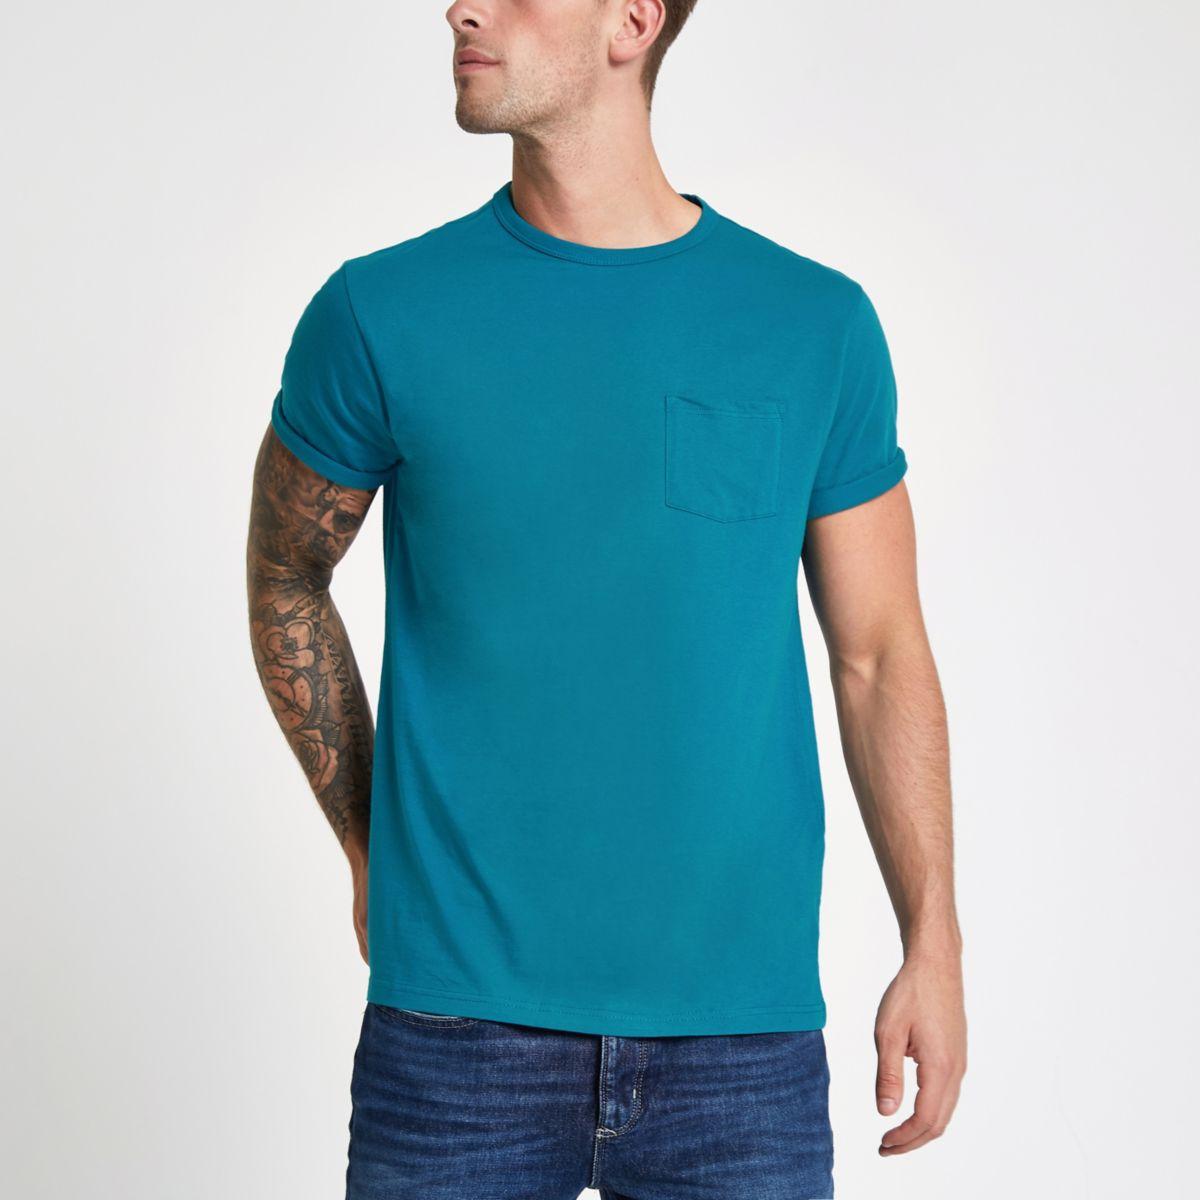 Turquoise crew neck chest pocket T-shirt